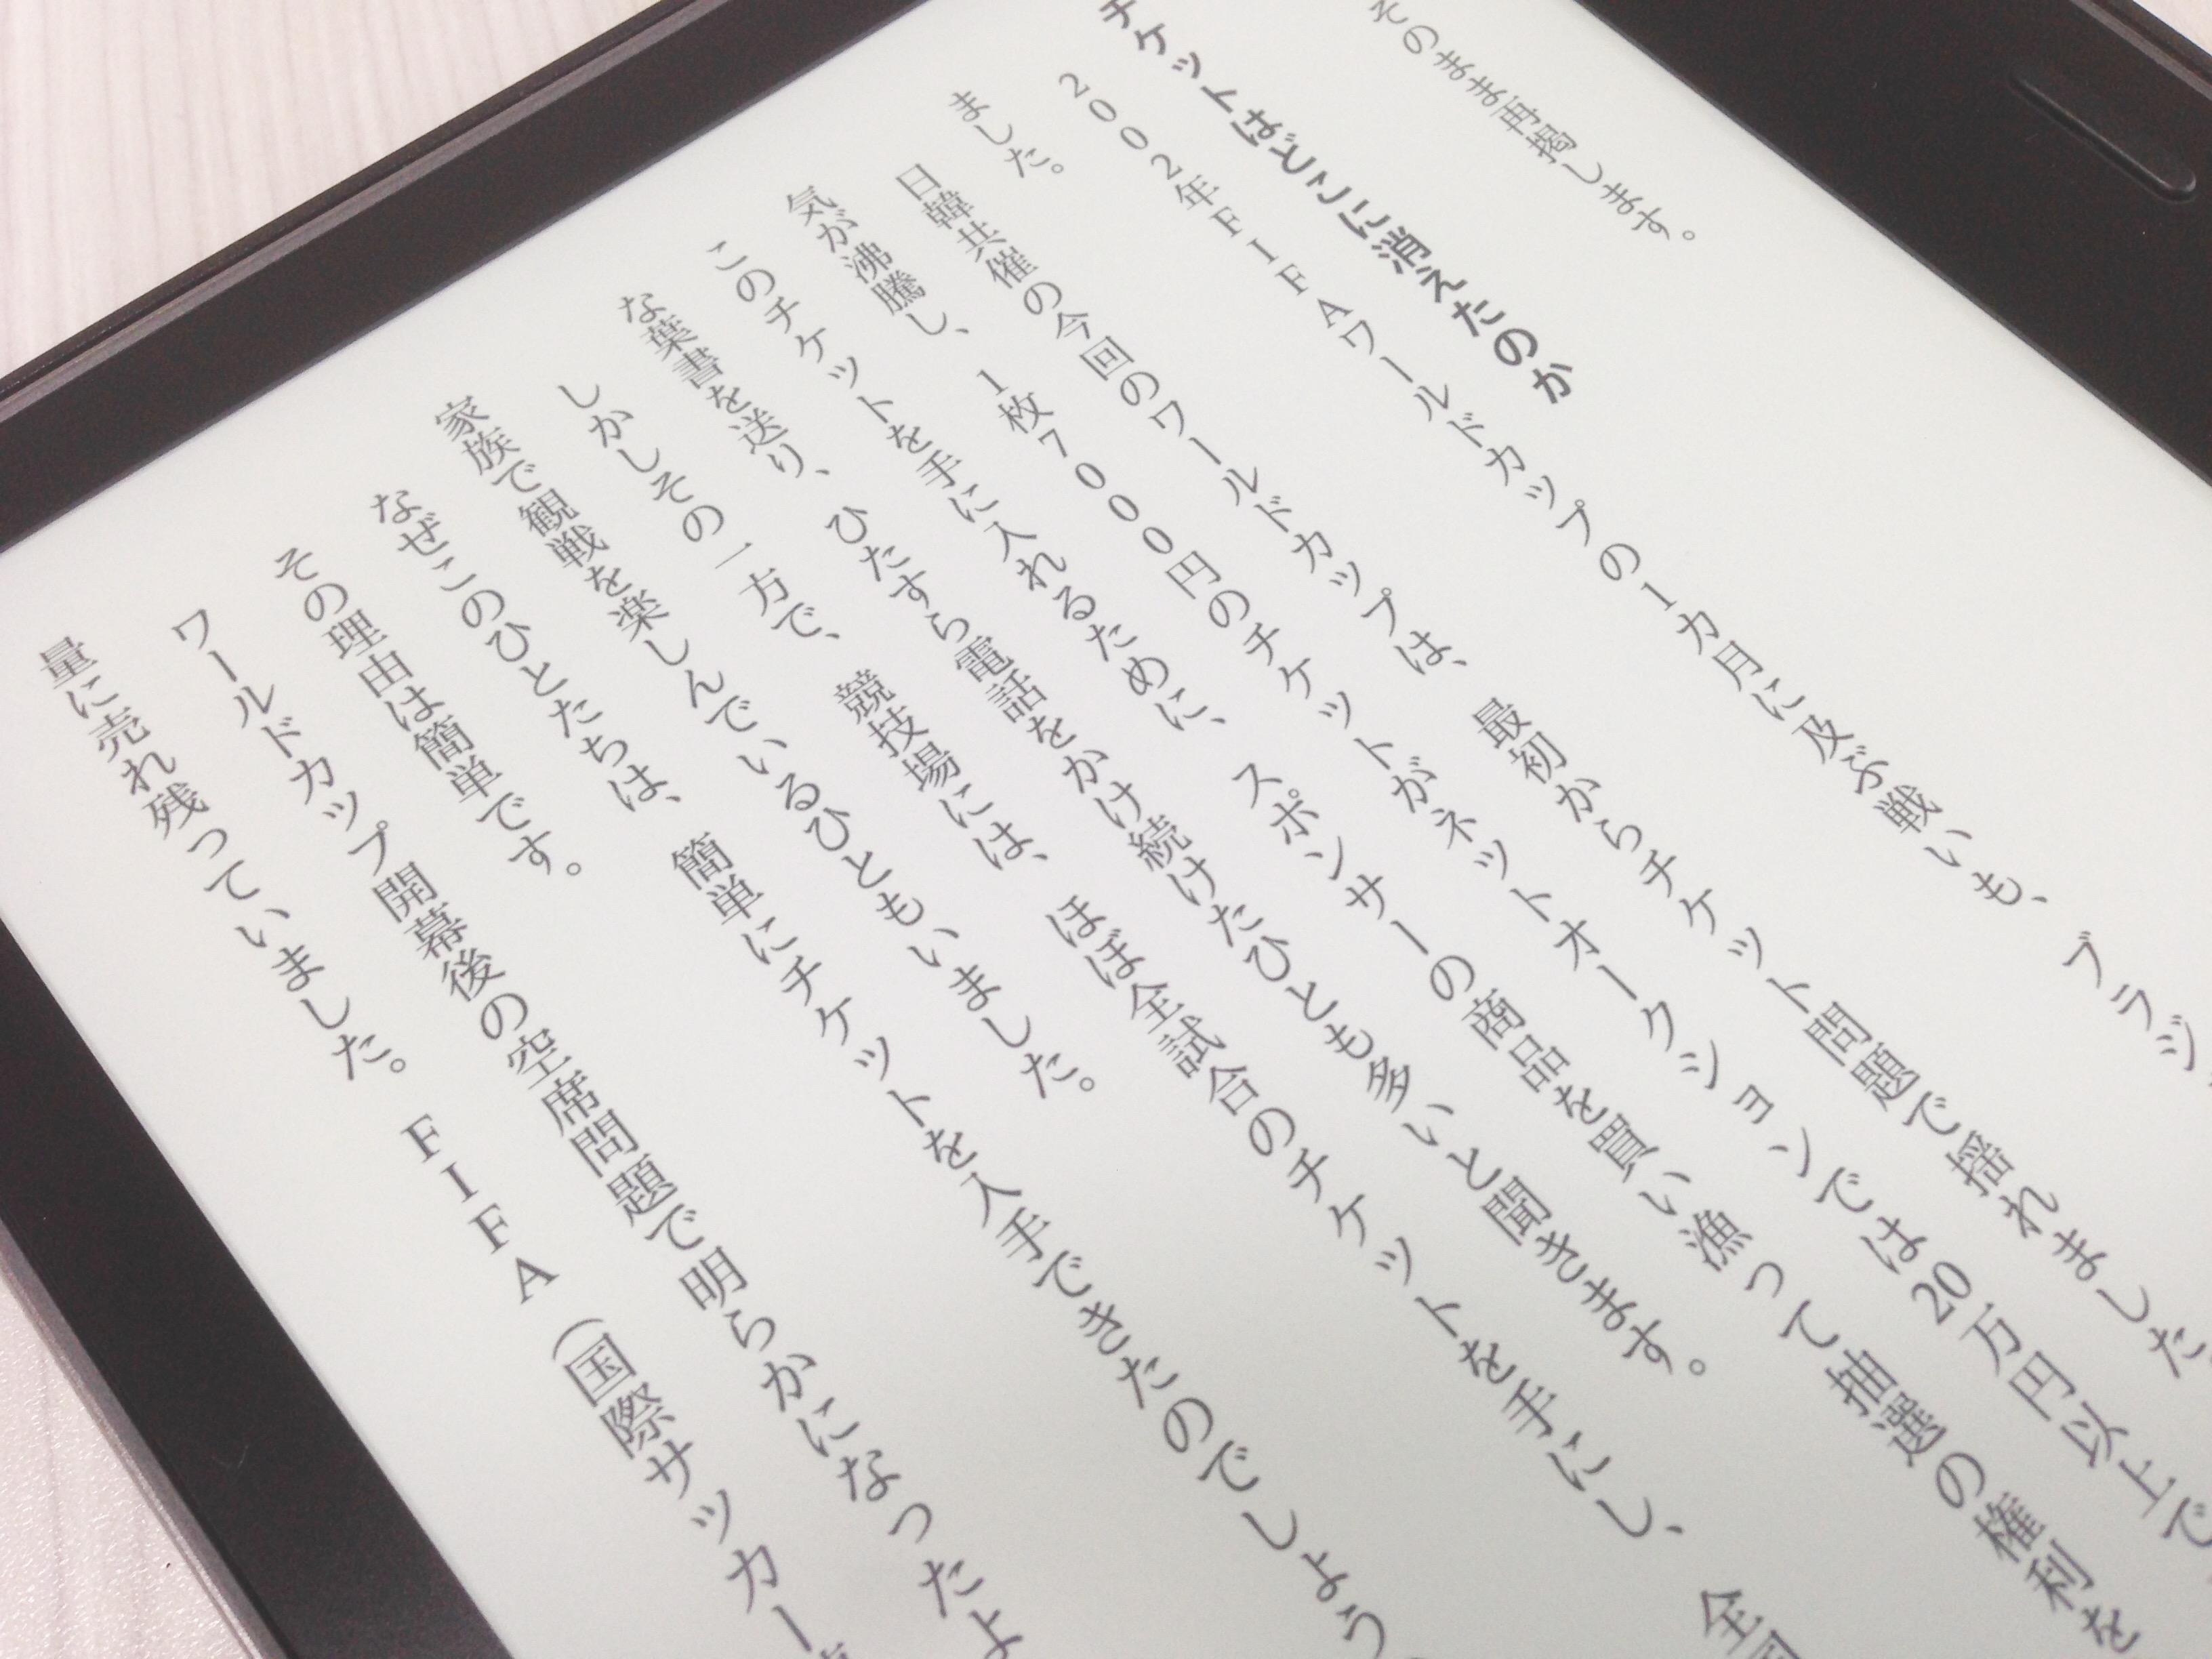 Kindleの白さがわかる写真